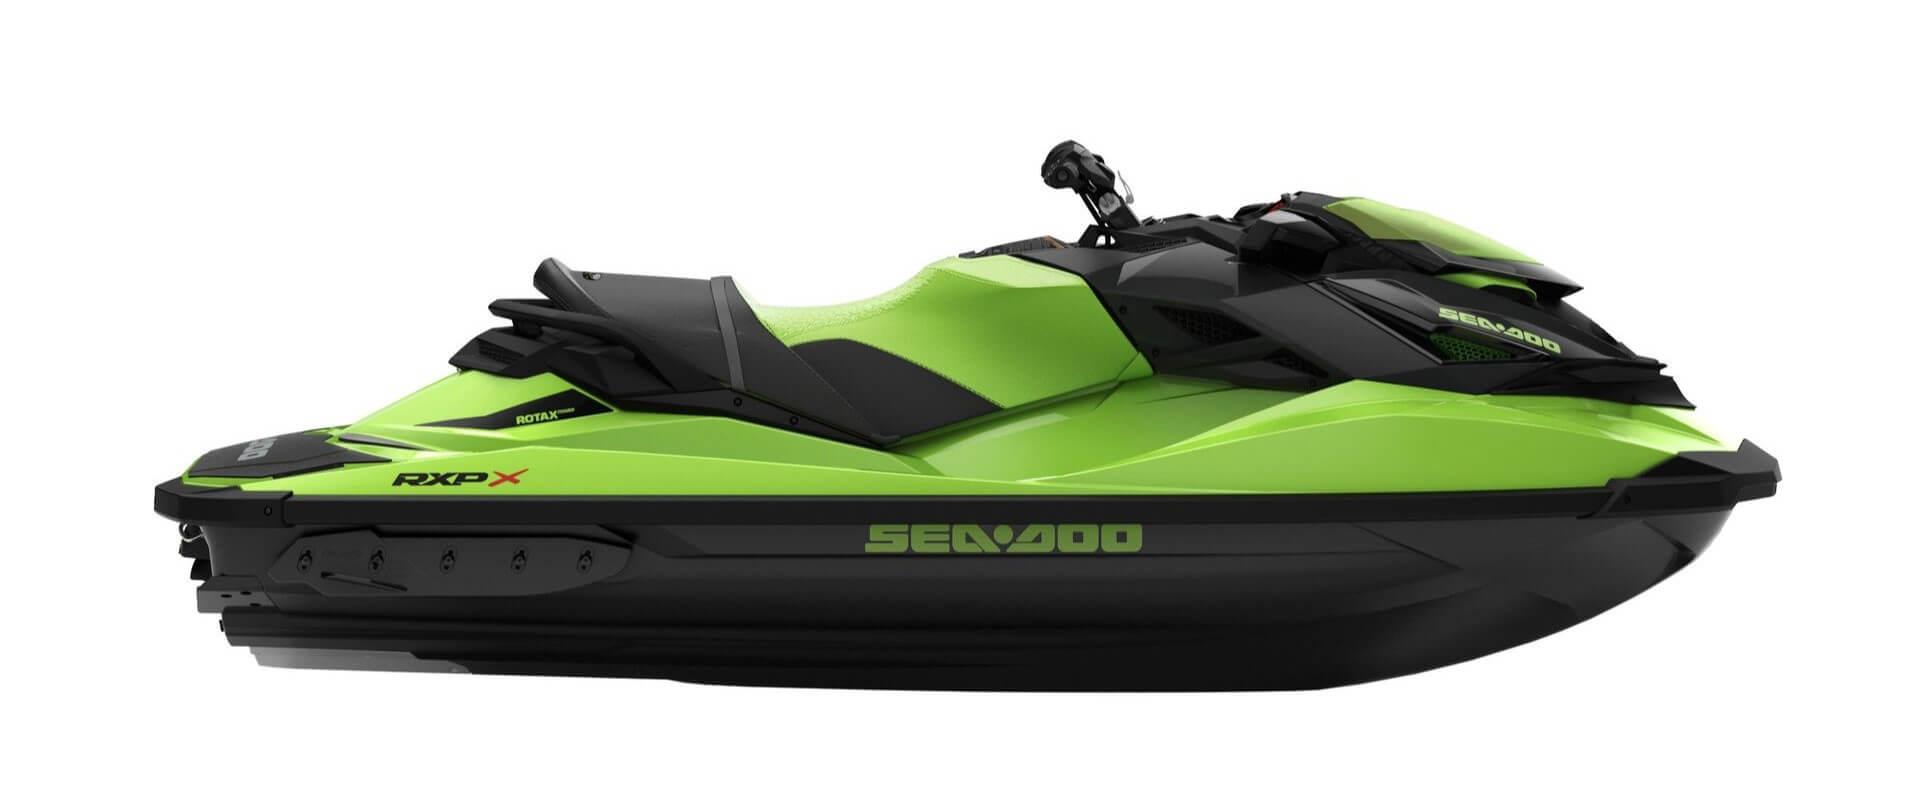 Jetski Racing RXP Seadoo